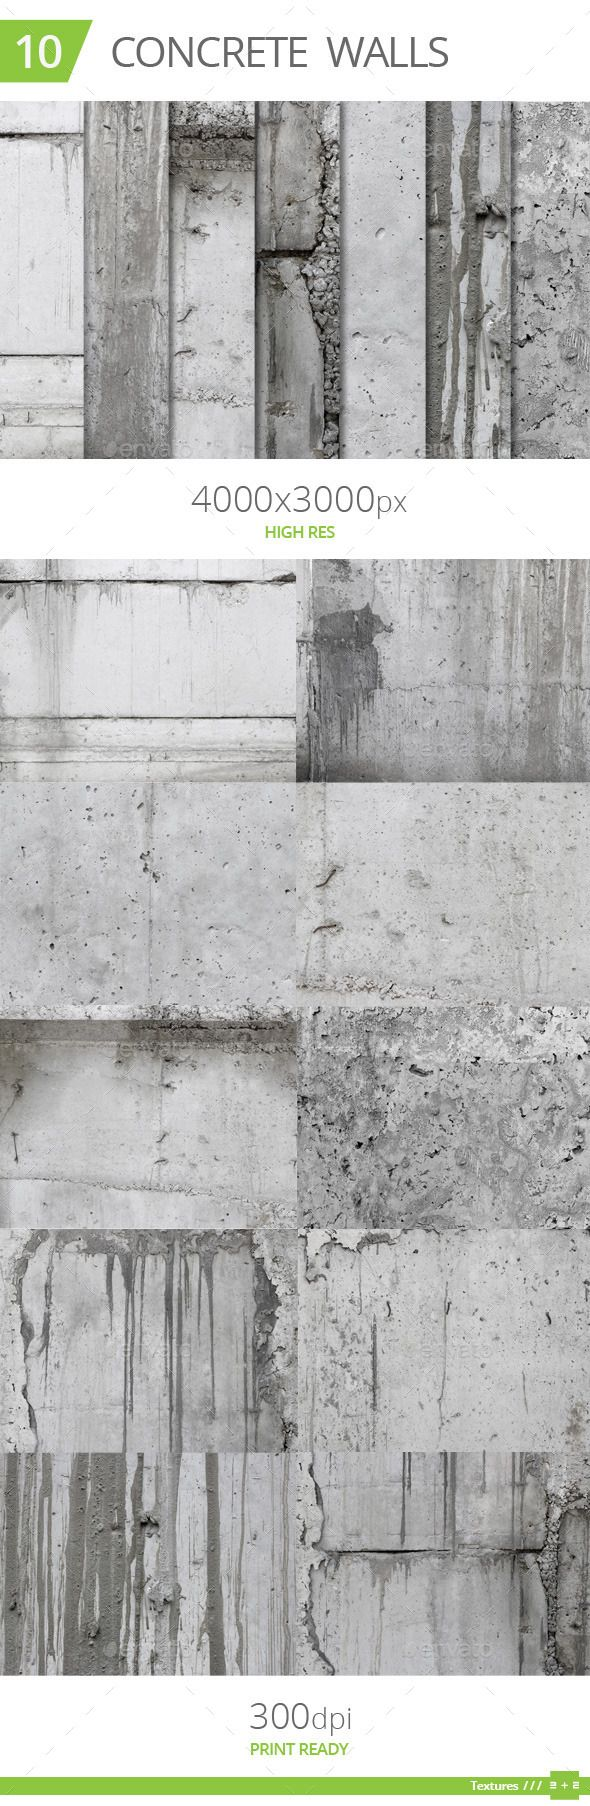 10 Concrete Walls Concrete Wall Concrete Wall Texture Textured Walls